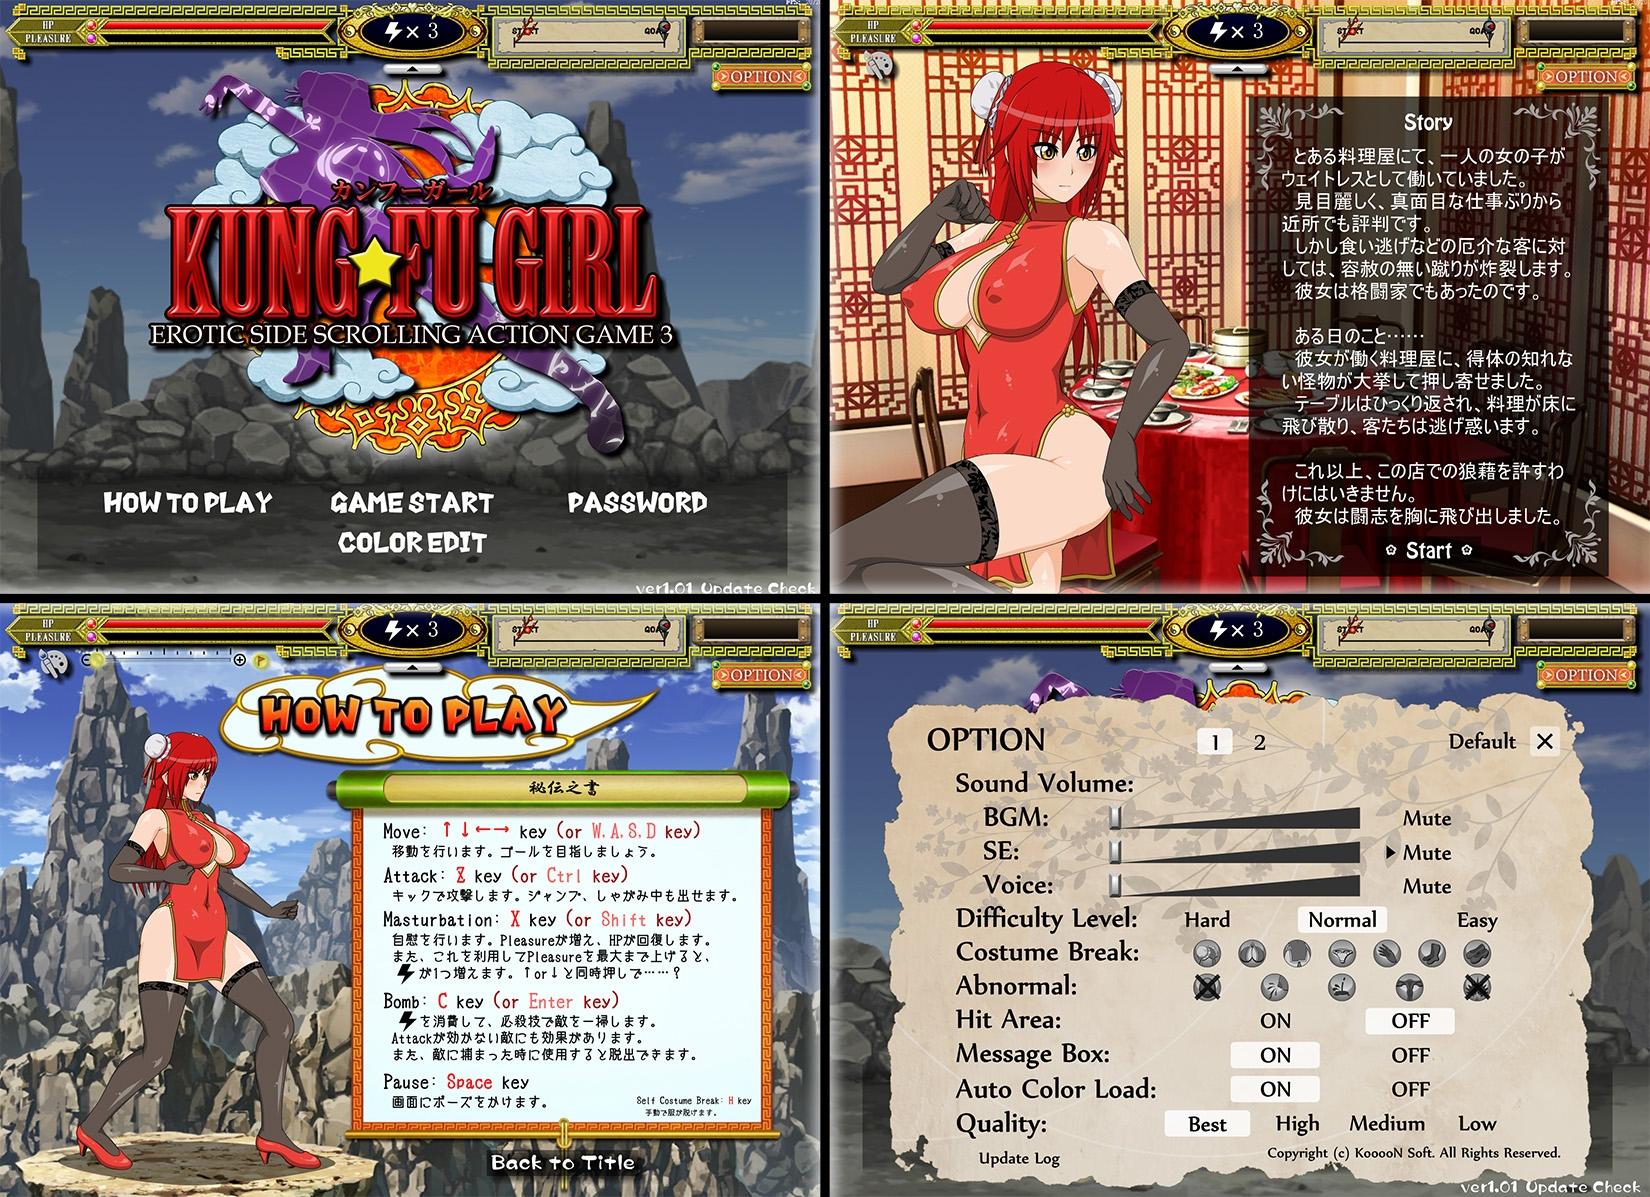 KUNG-FU GIRL -EROTIC SIDE SCROLLING ACTION GAME 3- [KooooN Soft]